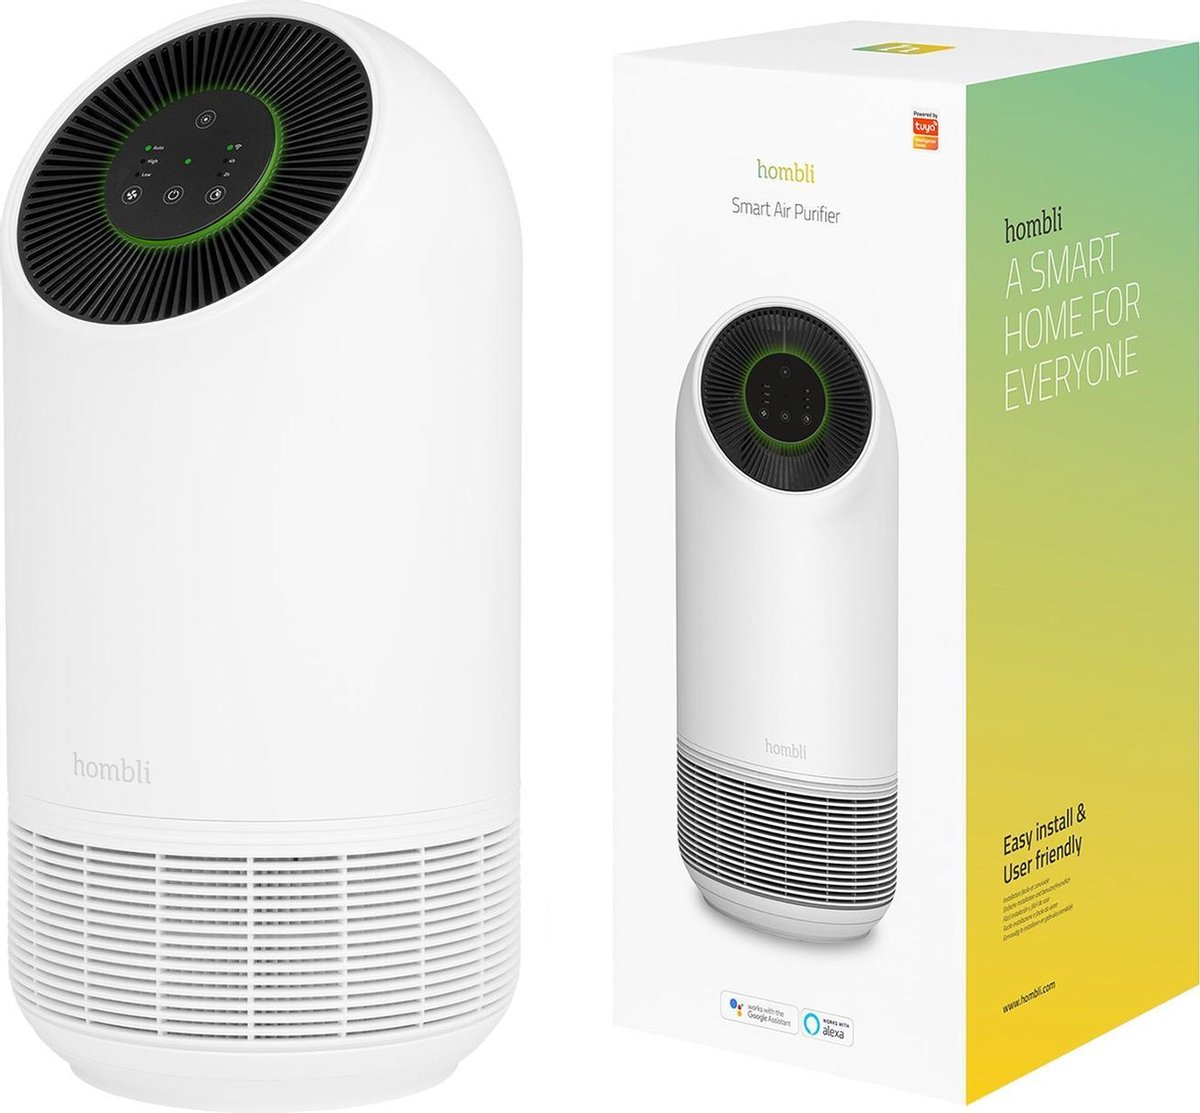 Hombli Smart Air Purifier – Luchtreiniger – HEPA 13 Filter en Actieve Koolstoffilter – Wifi – Bediening via App – Spraakbesturing met Google, Alexa en Siri